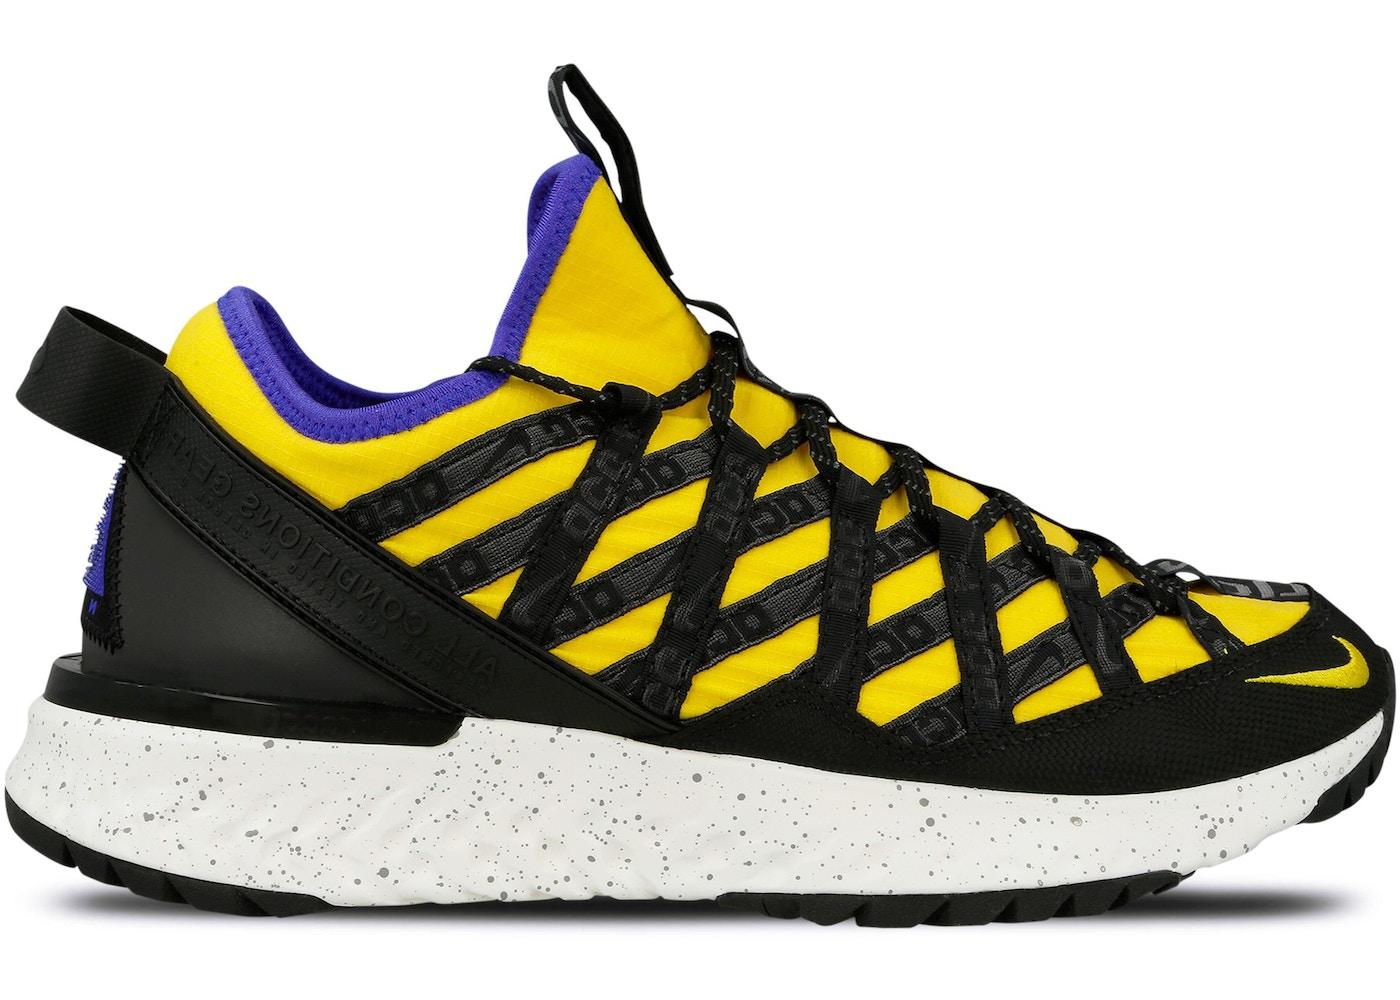 low priced 0092f aab79 Nike ACG React Terra Gobe Amarillo